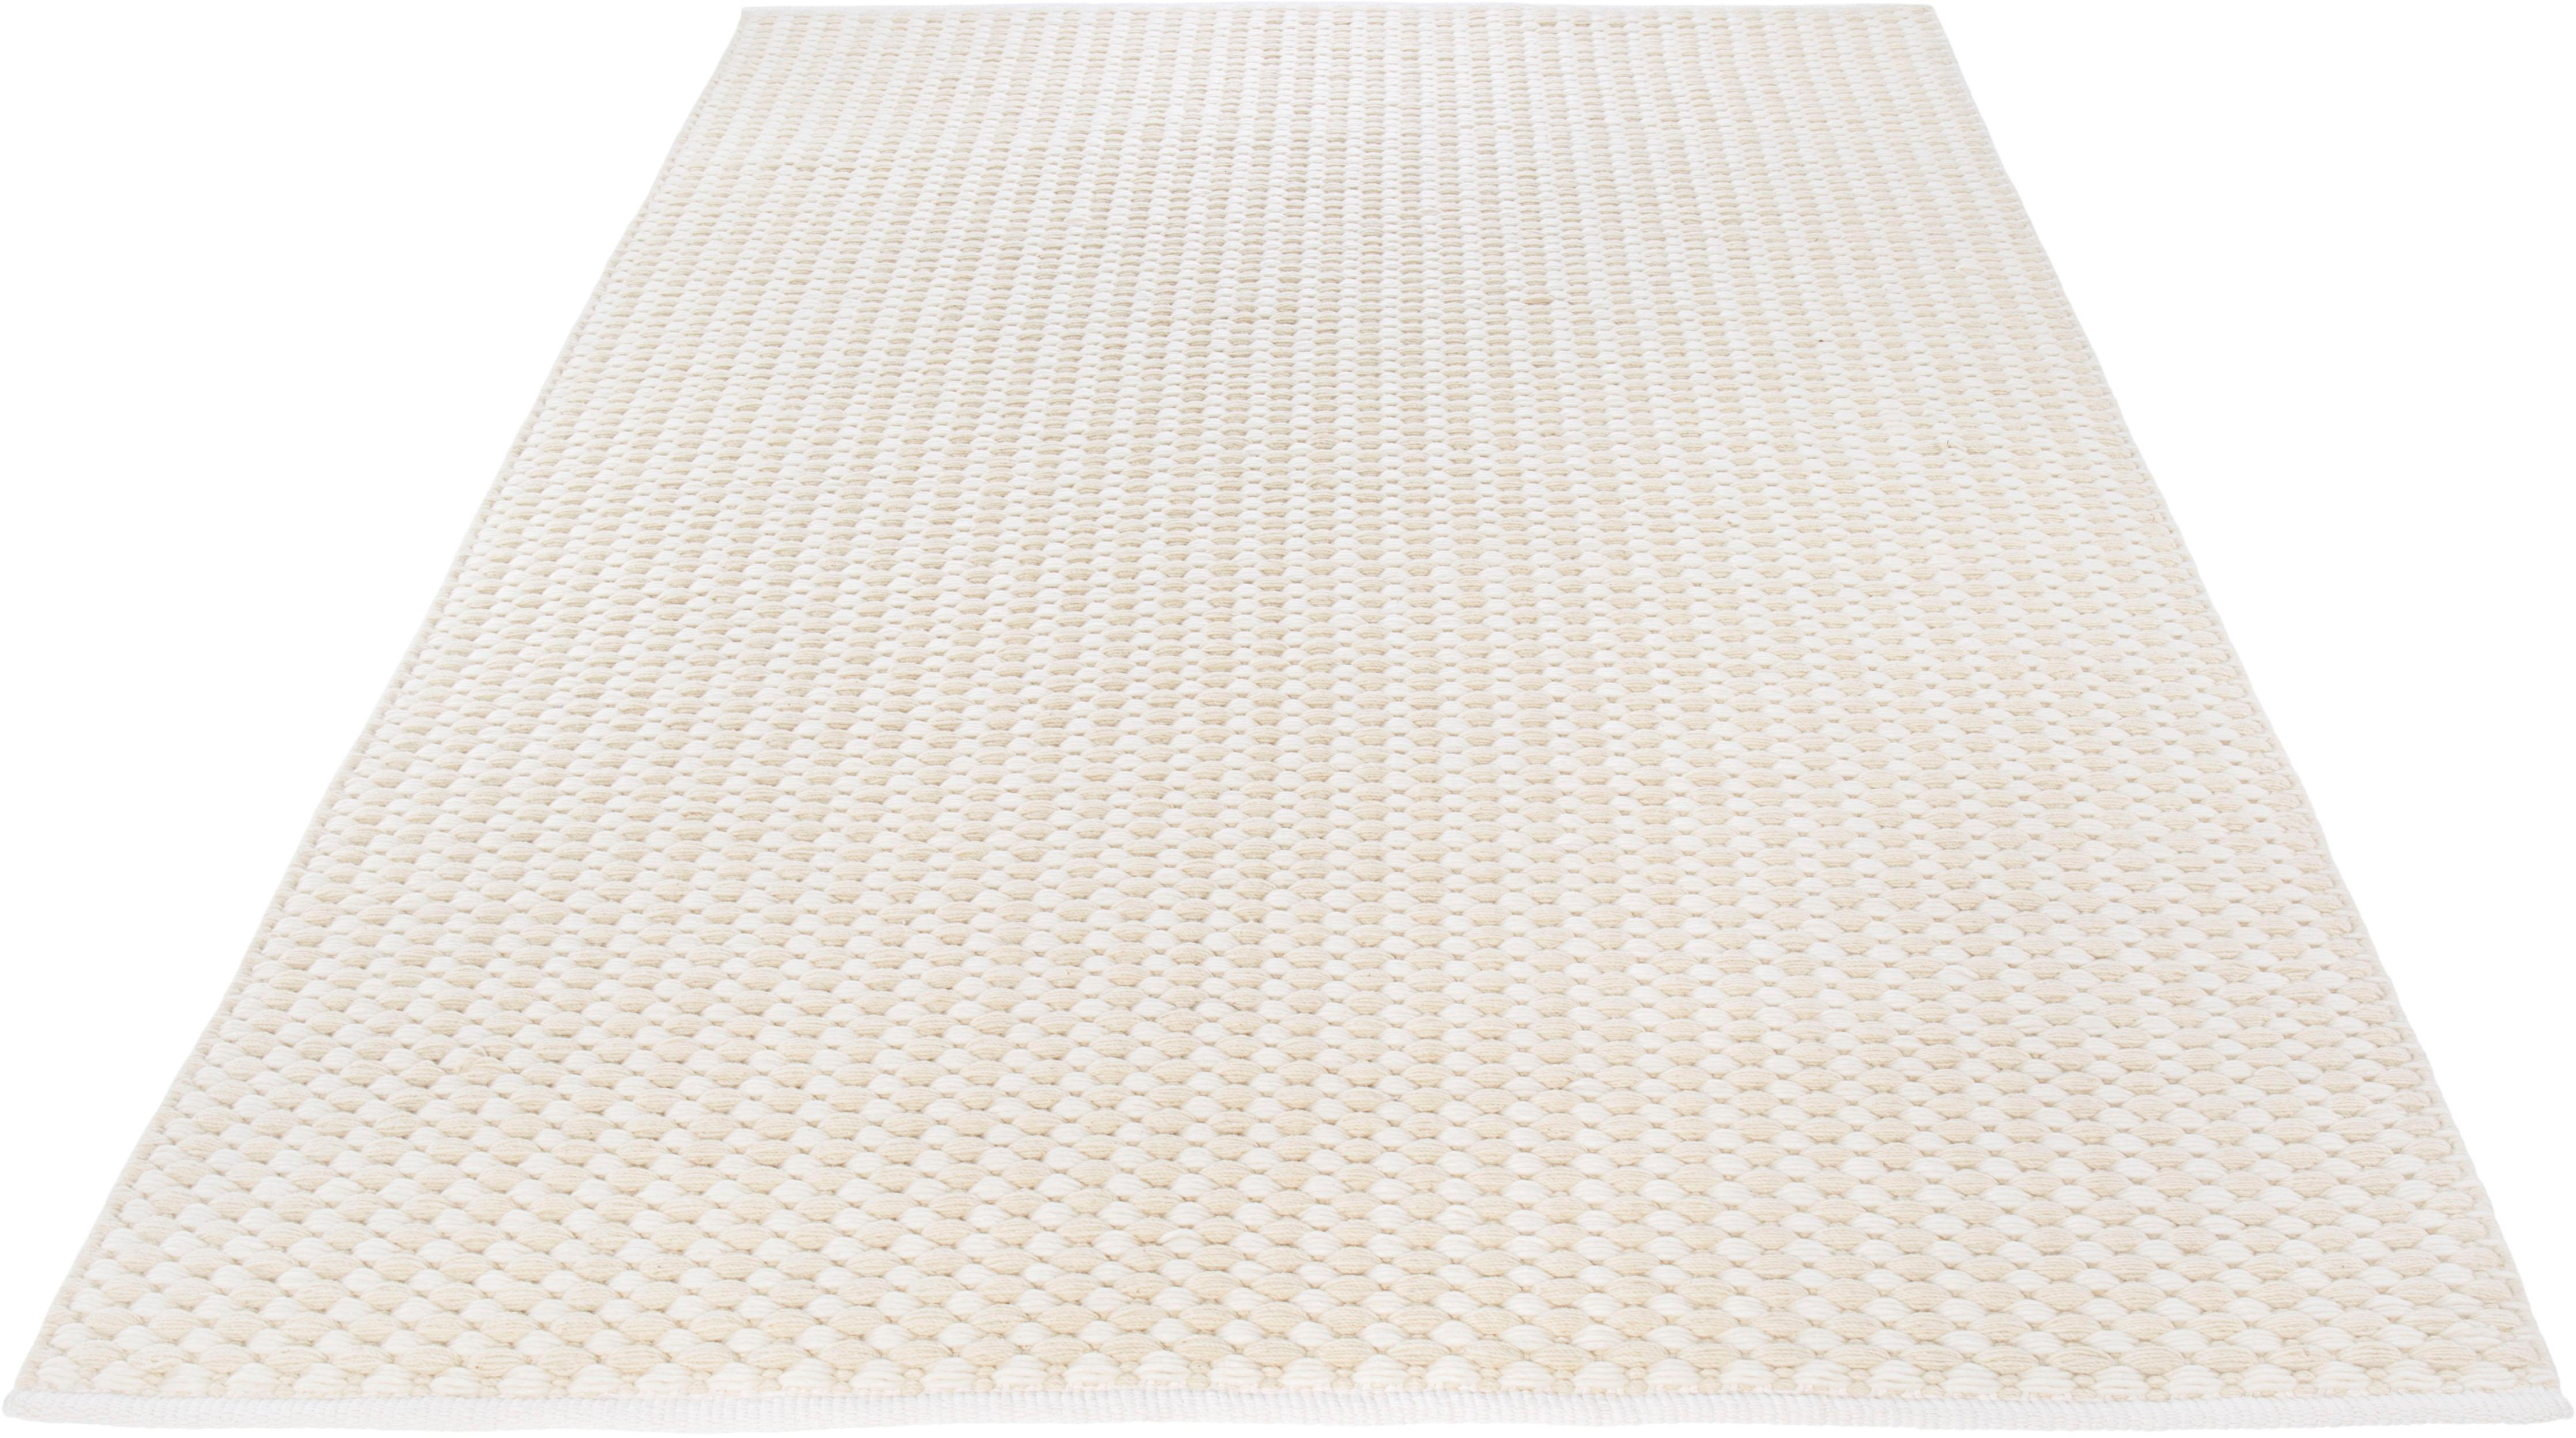 Teppich, »Finn«, Wohnidee, rechteckig, Höhe 12 mm, handgewebt